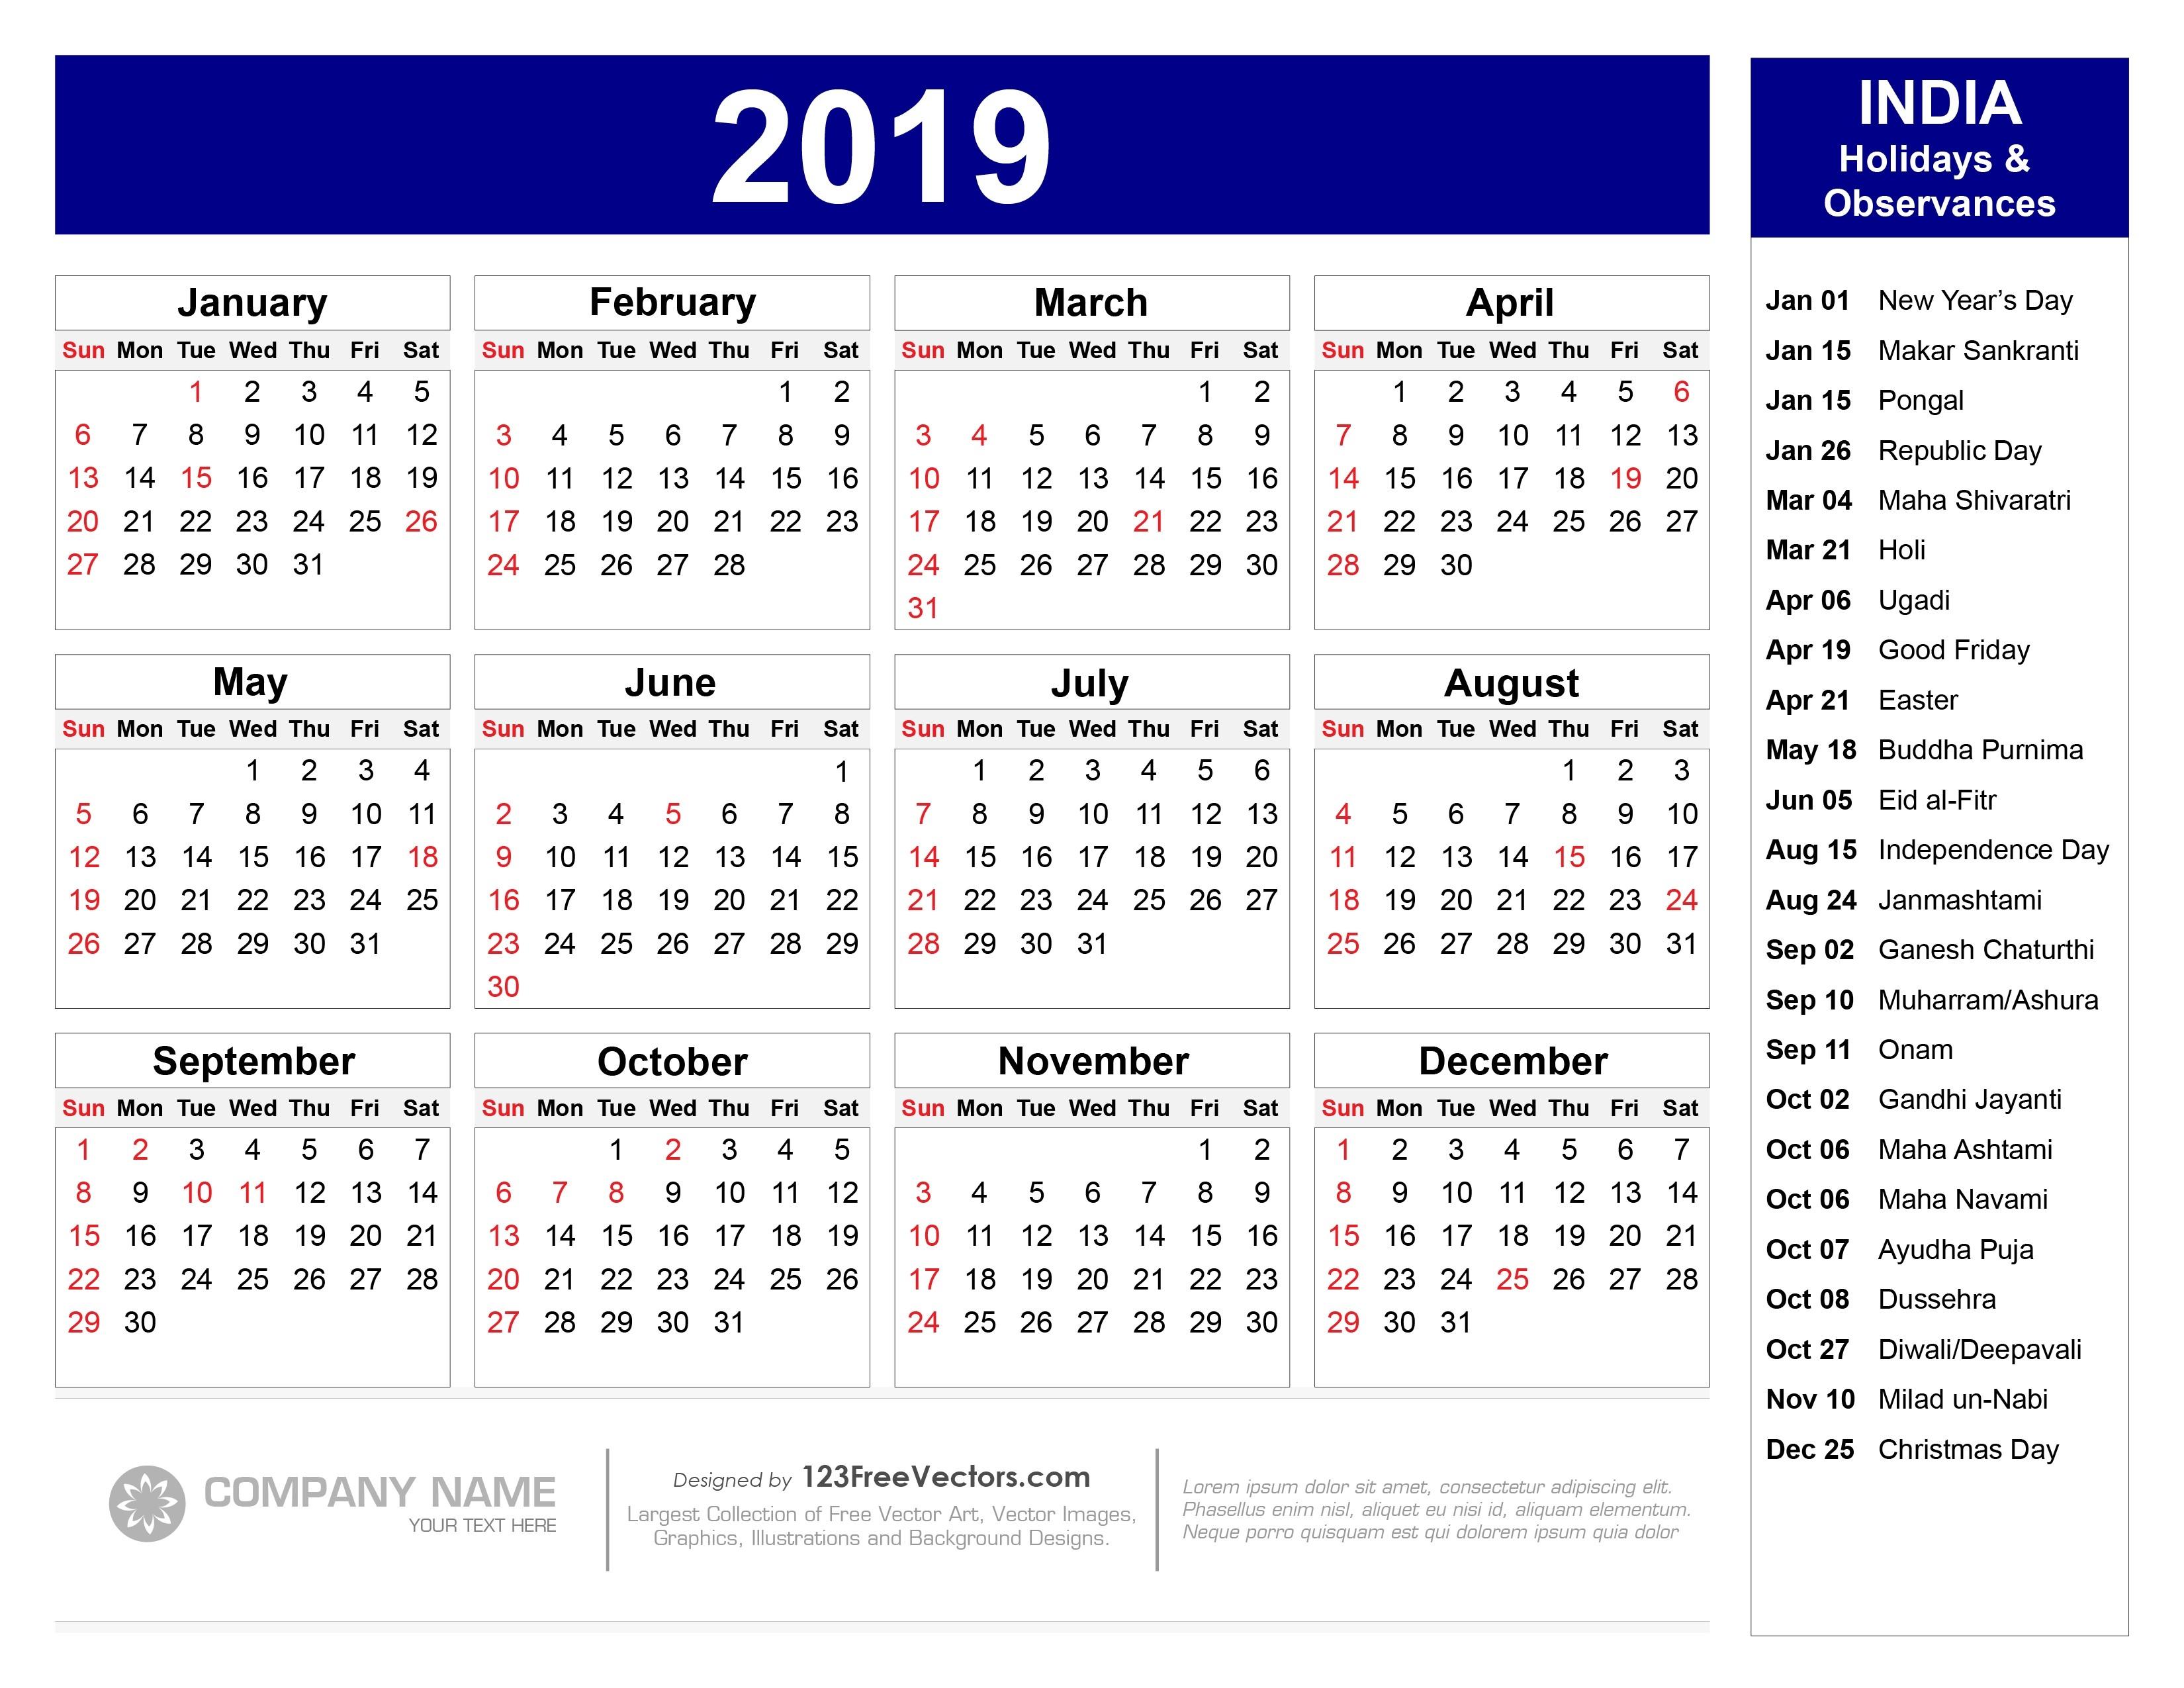 2019 Calendar With Indian Holidays Pdf-Printable 2020 Holidays India